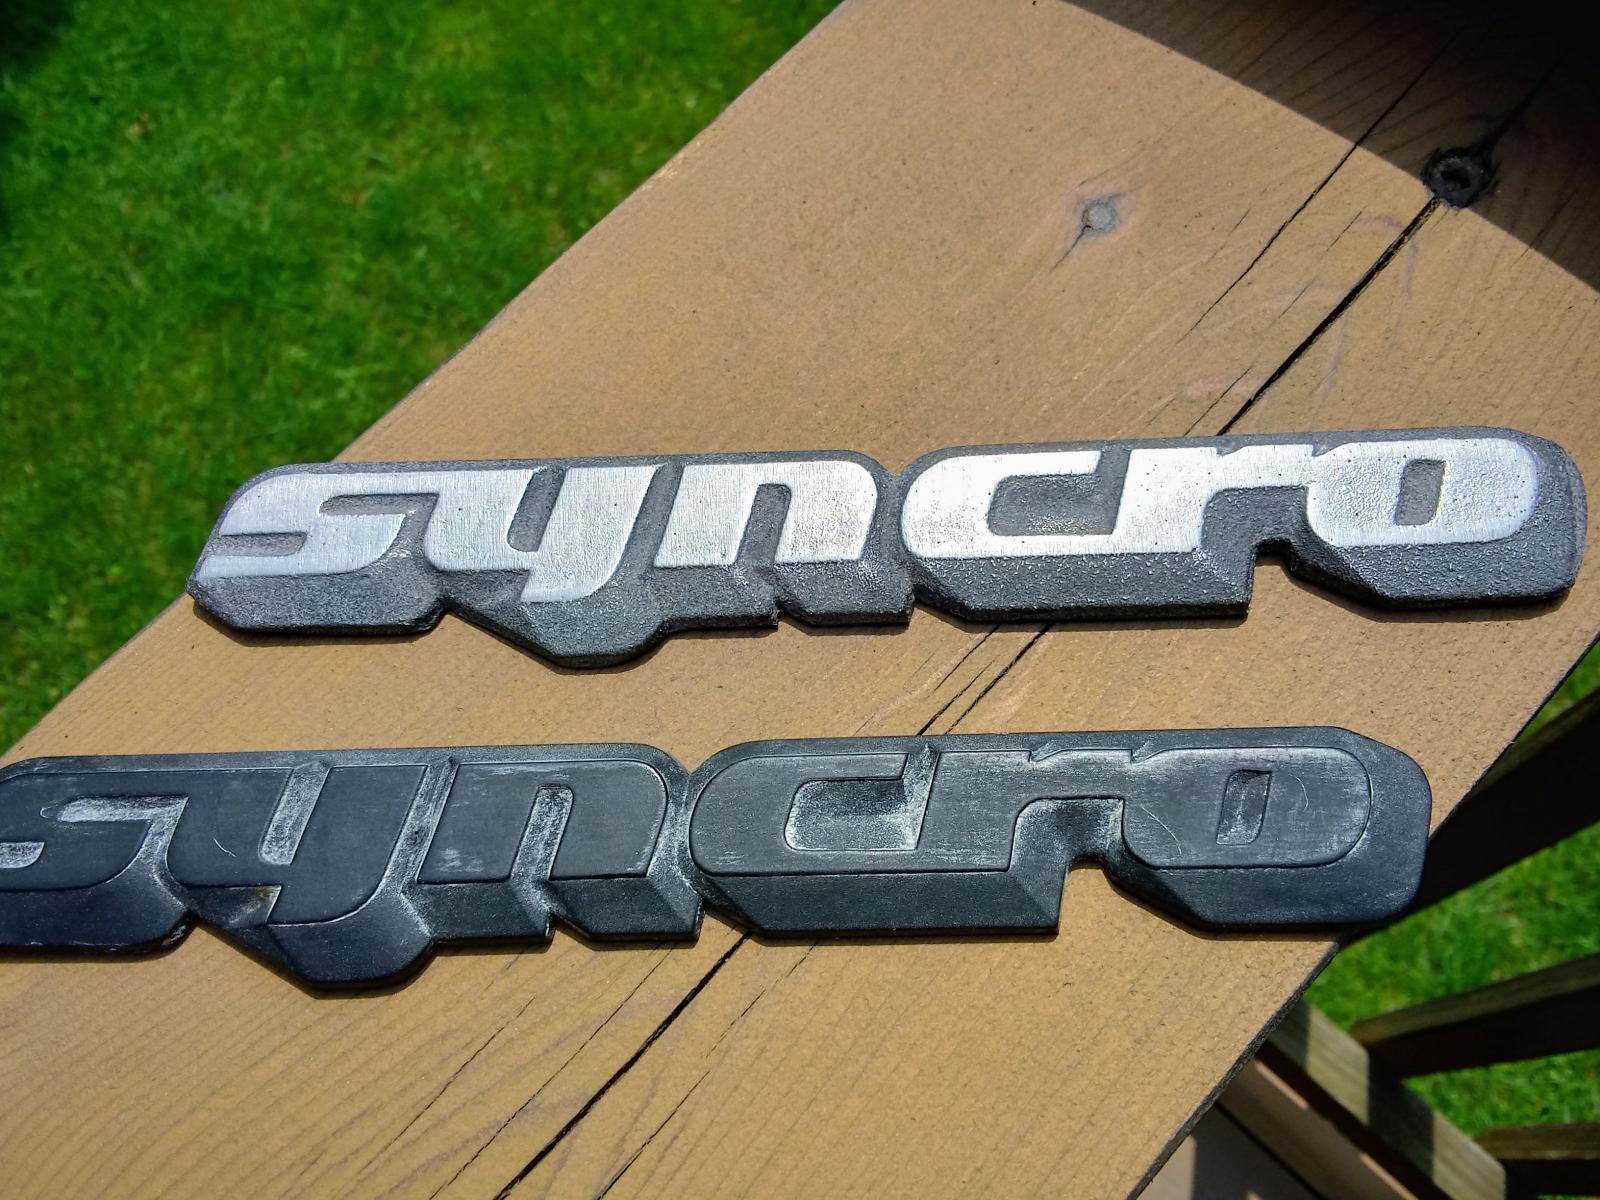 Alloy Syncro emblem by Outcaststudios